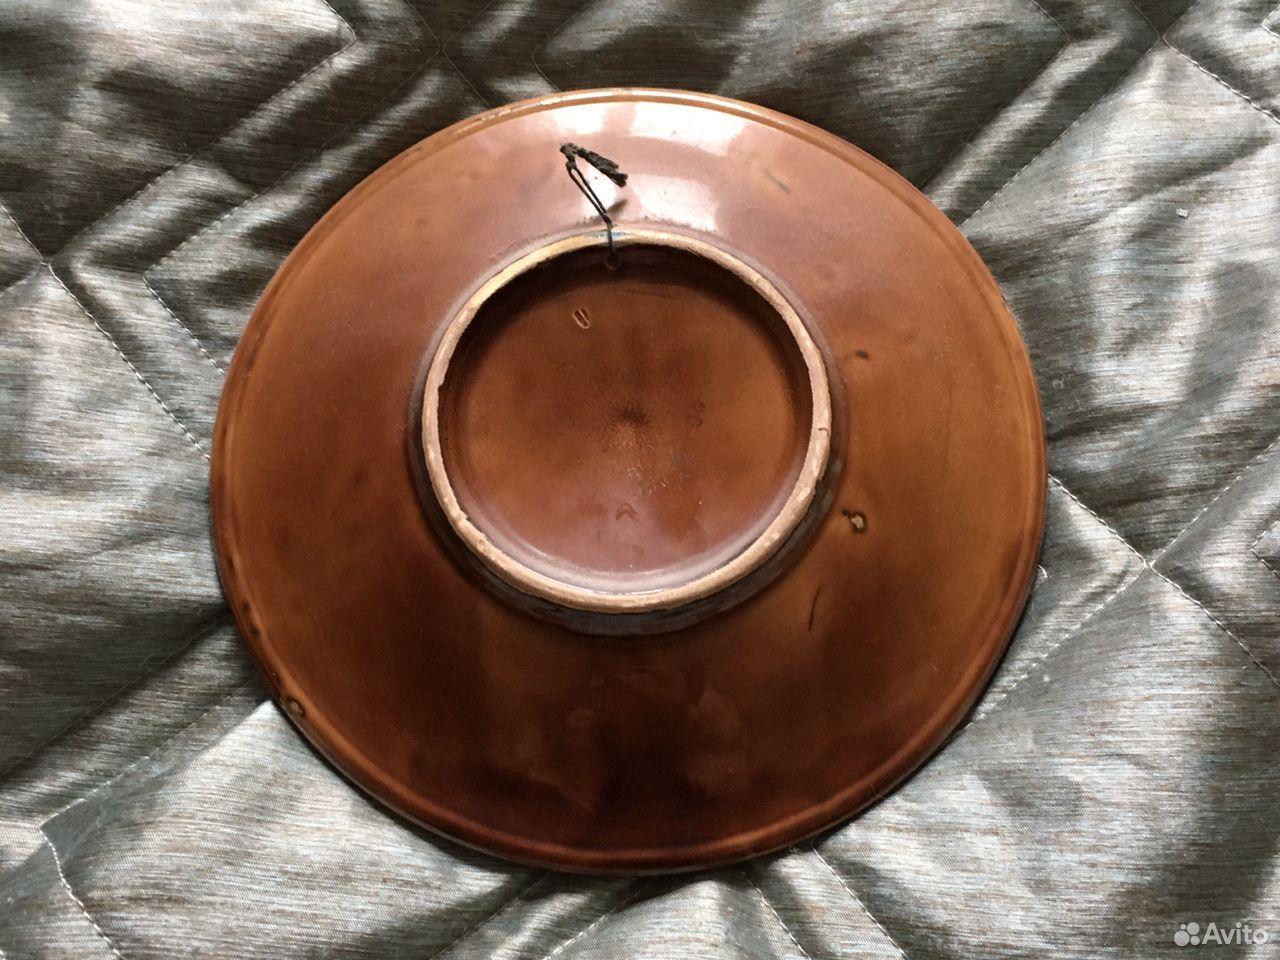 Тарелка настенная Конаково зик  89193693284 купить 2